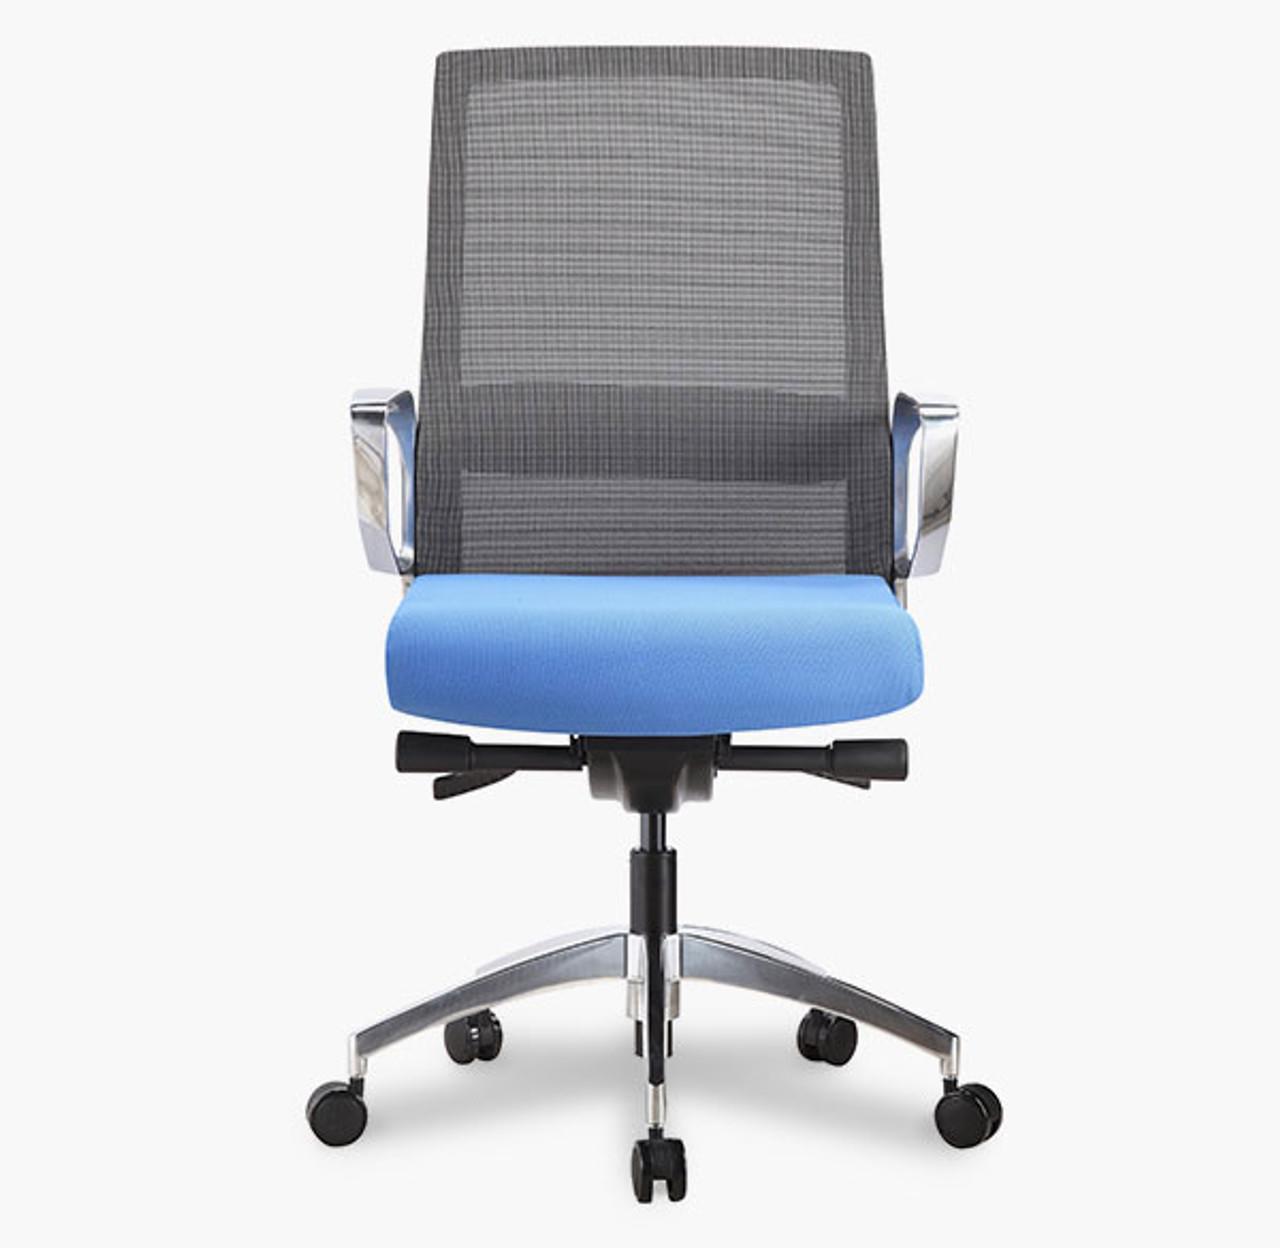 Fabulous Wyatt Freeride Adjustable Modern Conference Chair Uwap Interior Chair Design Uwaporg